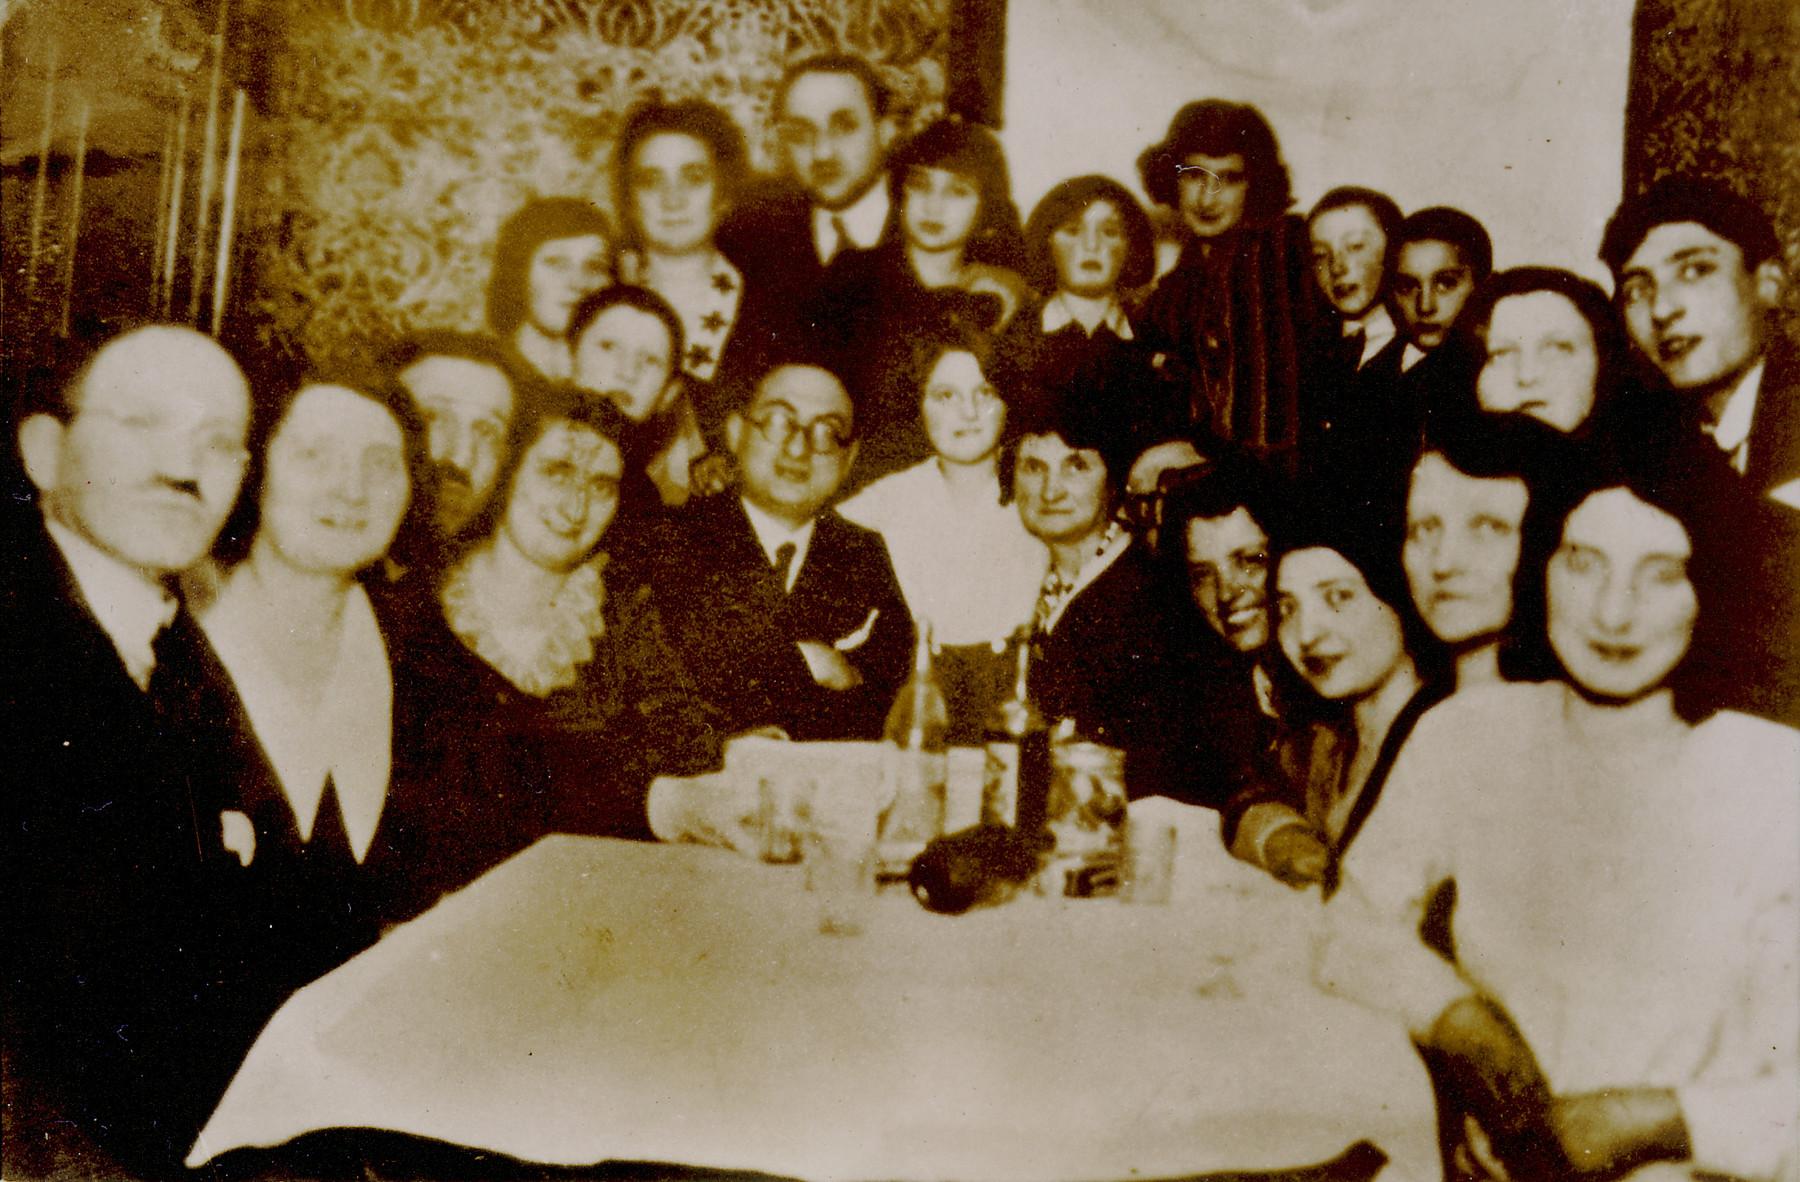 Family of Irving Czestochowski, cousin of Mery Nowogrodski, seated around a table.  Seated from left to right are Mr. Jakubowski, Mrs. Jakubowski, Jankel Lis, Dorcia Lis, Michael Czestochowski, Halinka Lis and Ruchl Czestochowski.  Among those standing are Rywka Czestochowski, Chil Czestochowski, Helcia Chestochowski, Jakubowski and Jakubowski.